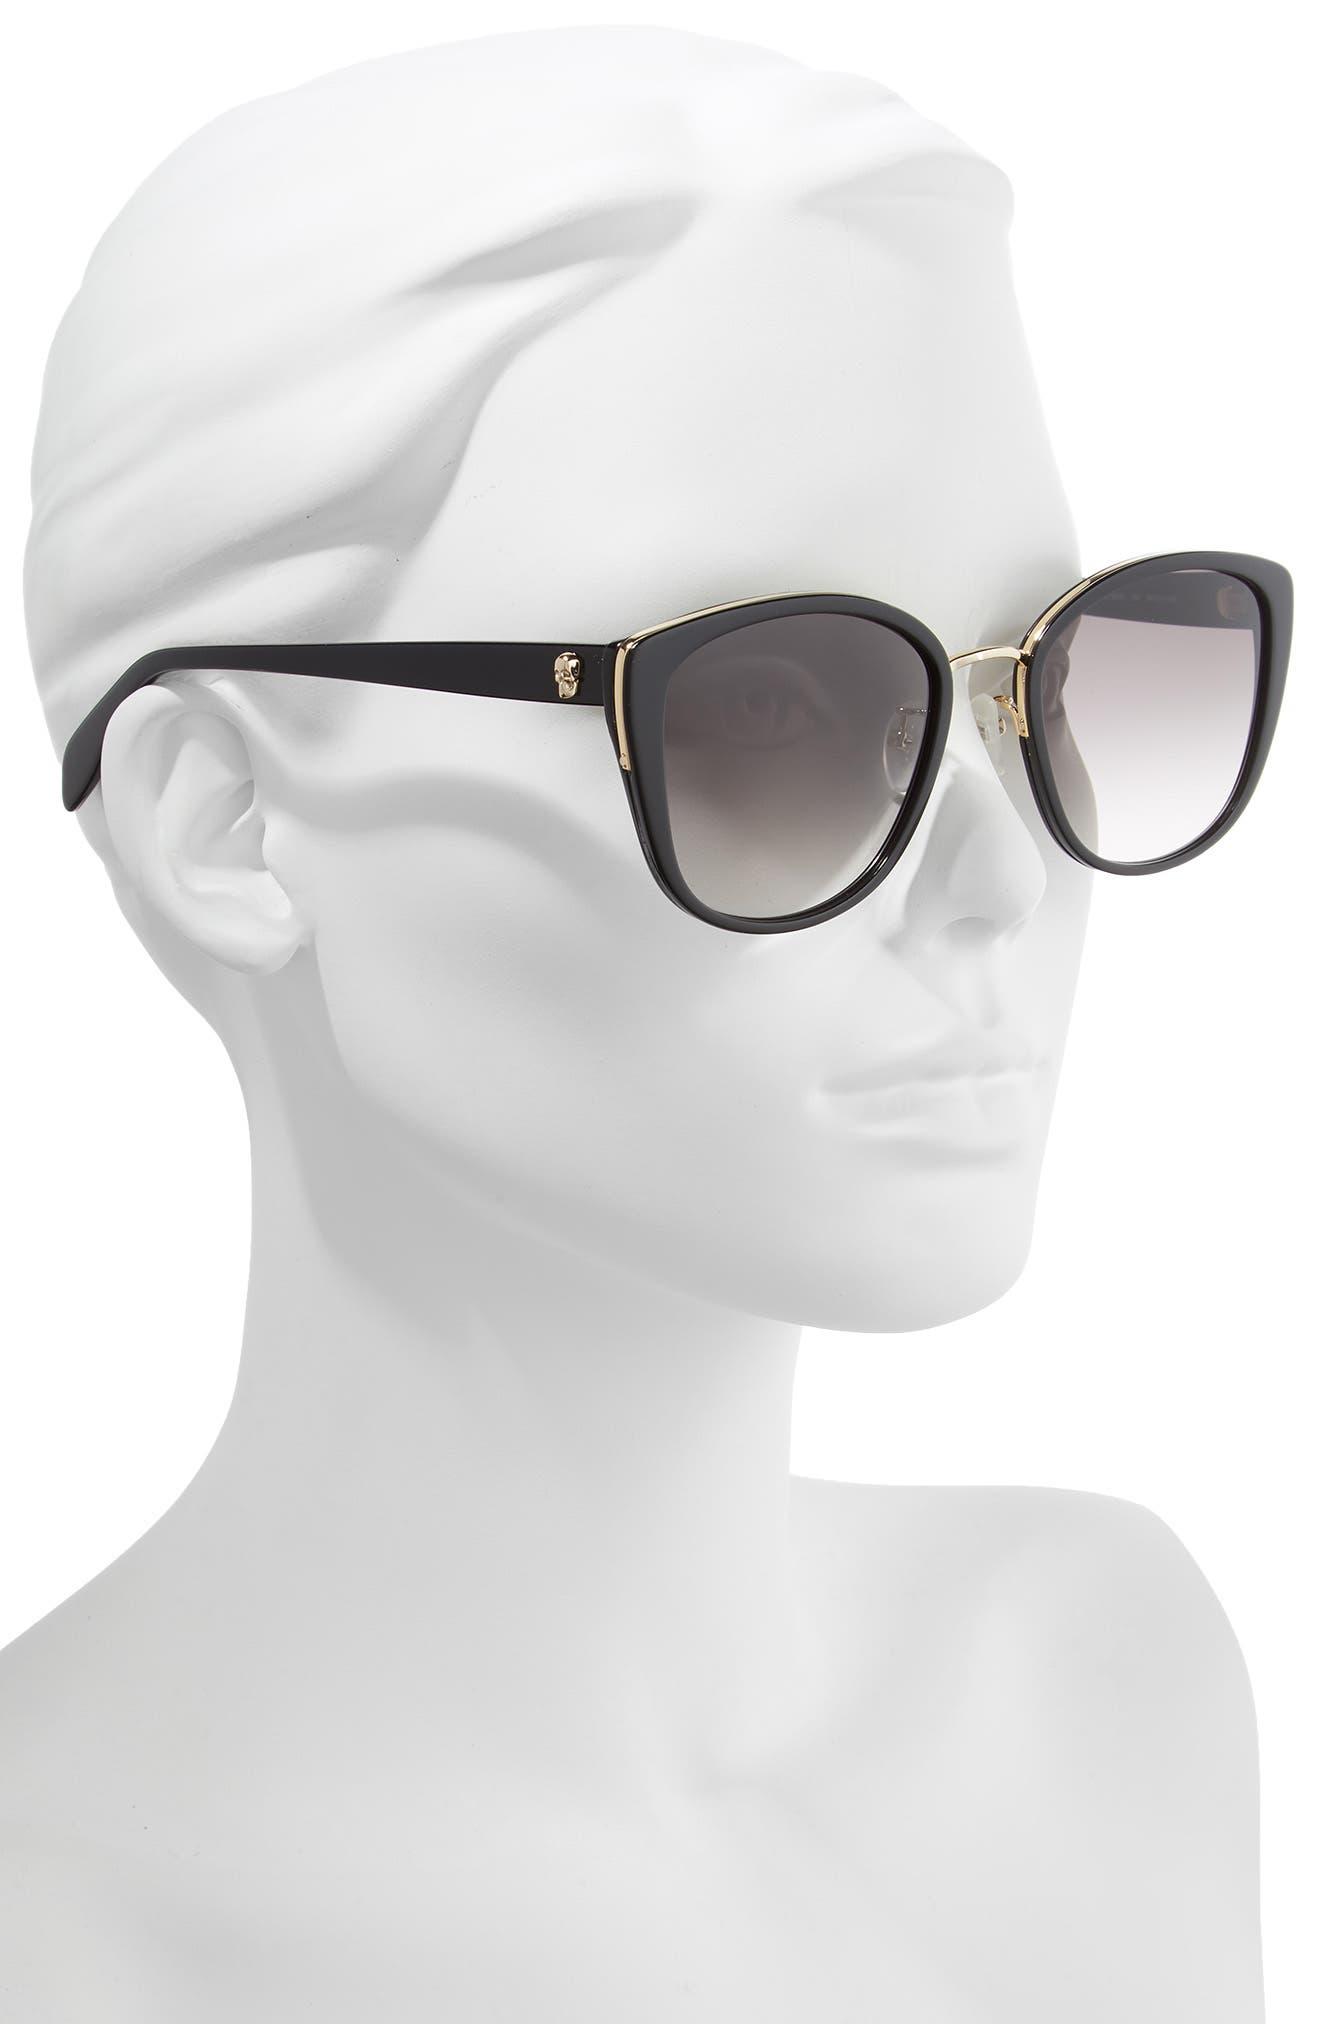 ALEXANDER MCQUEEN,                             56mm Gradient Round Sunglasses,                             Alternate thumbnail 2, color,                             BLACK/ GOLD